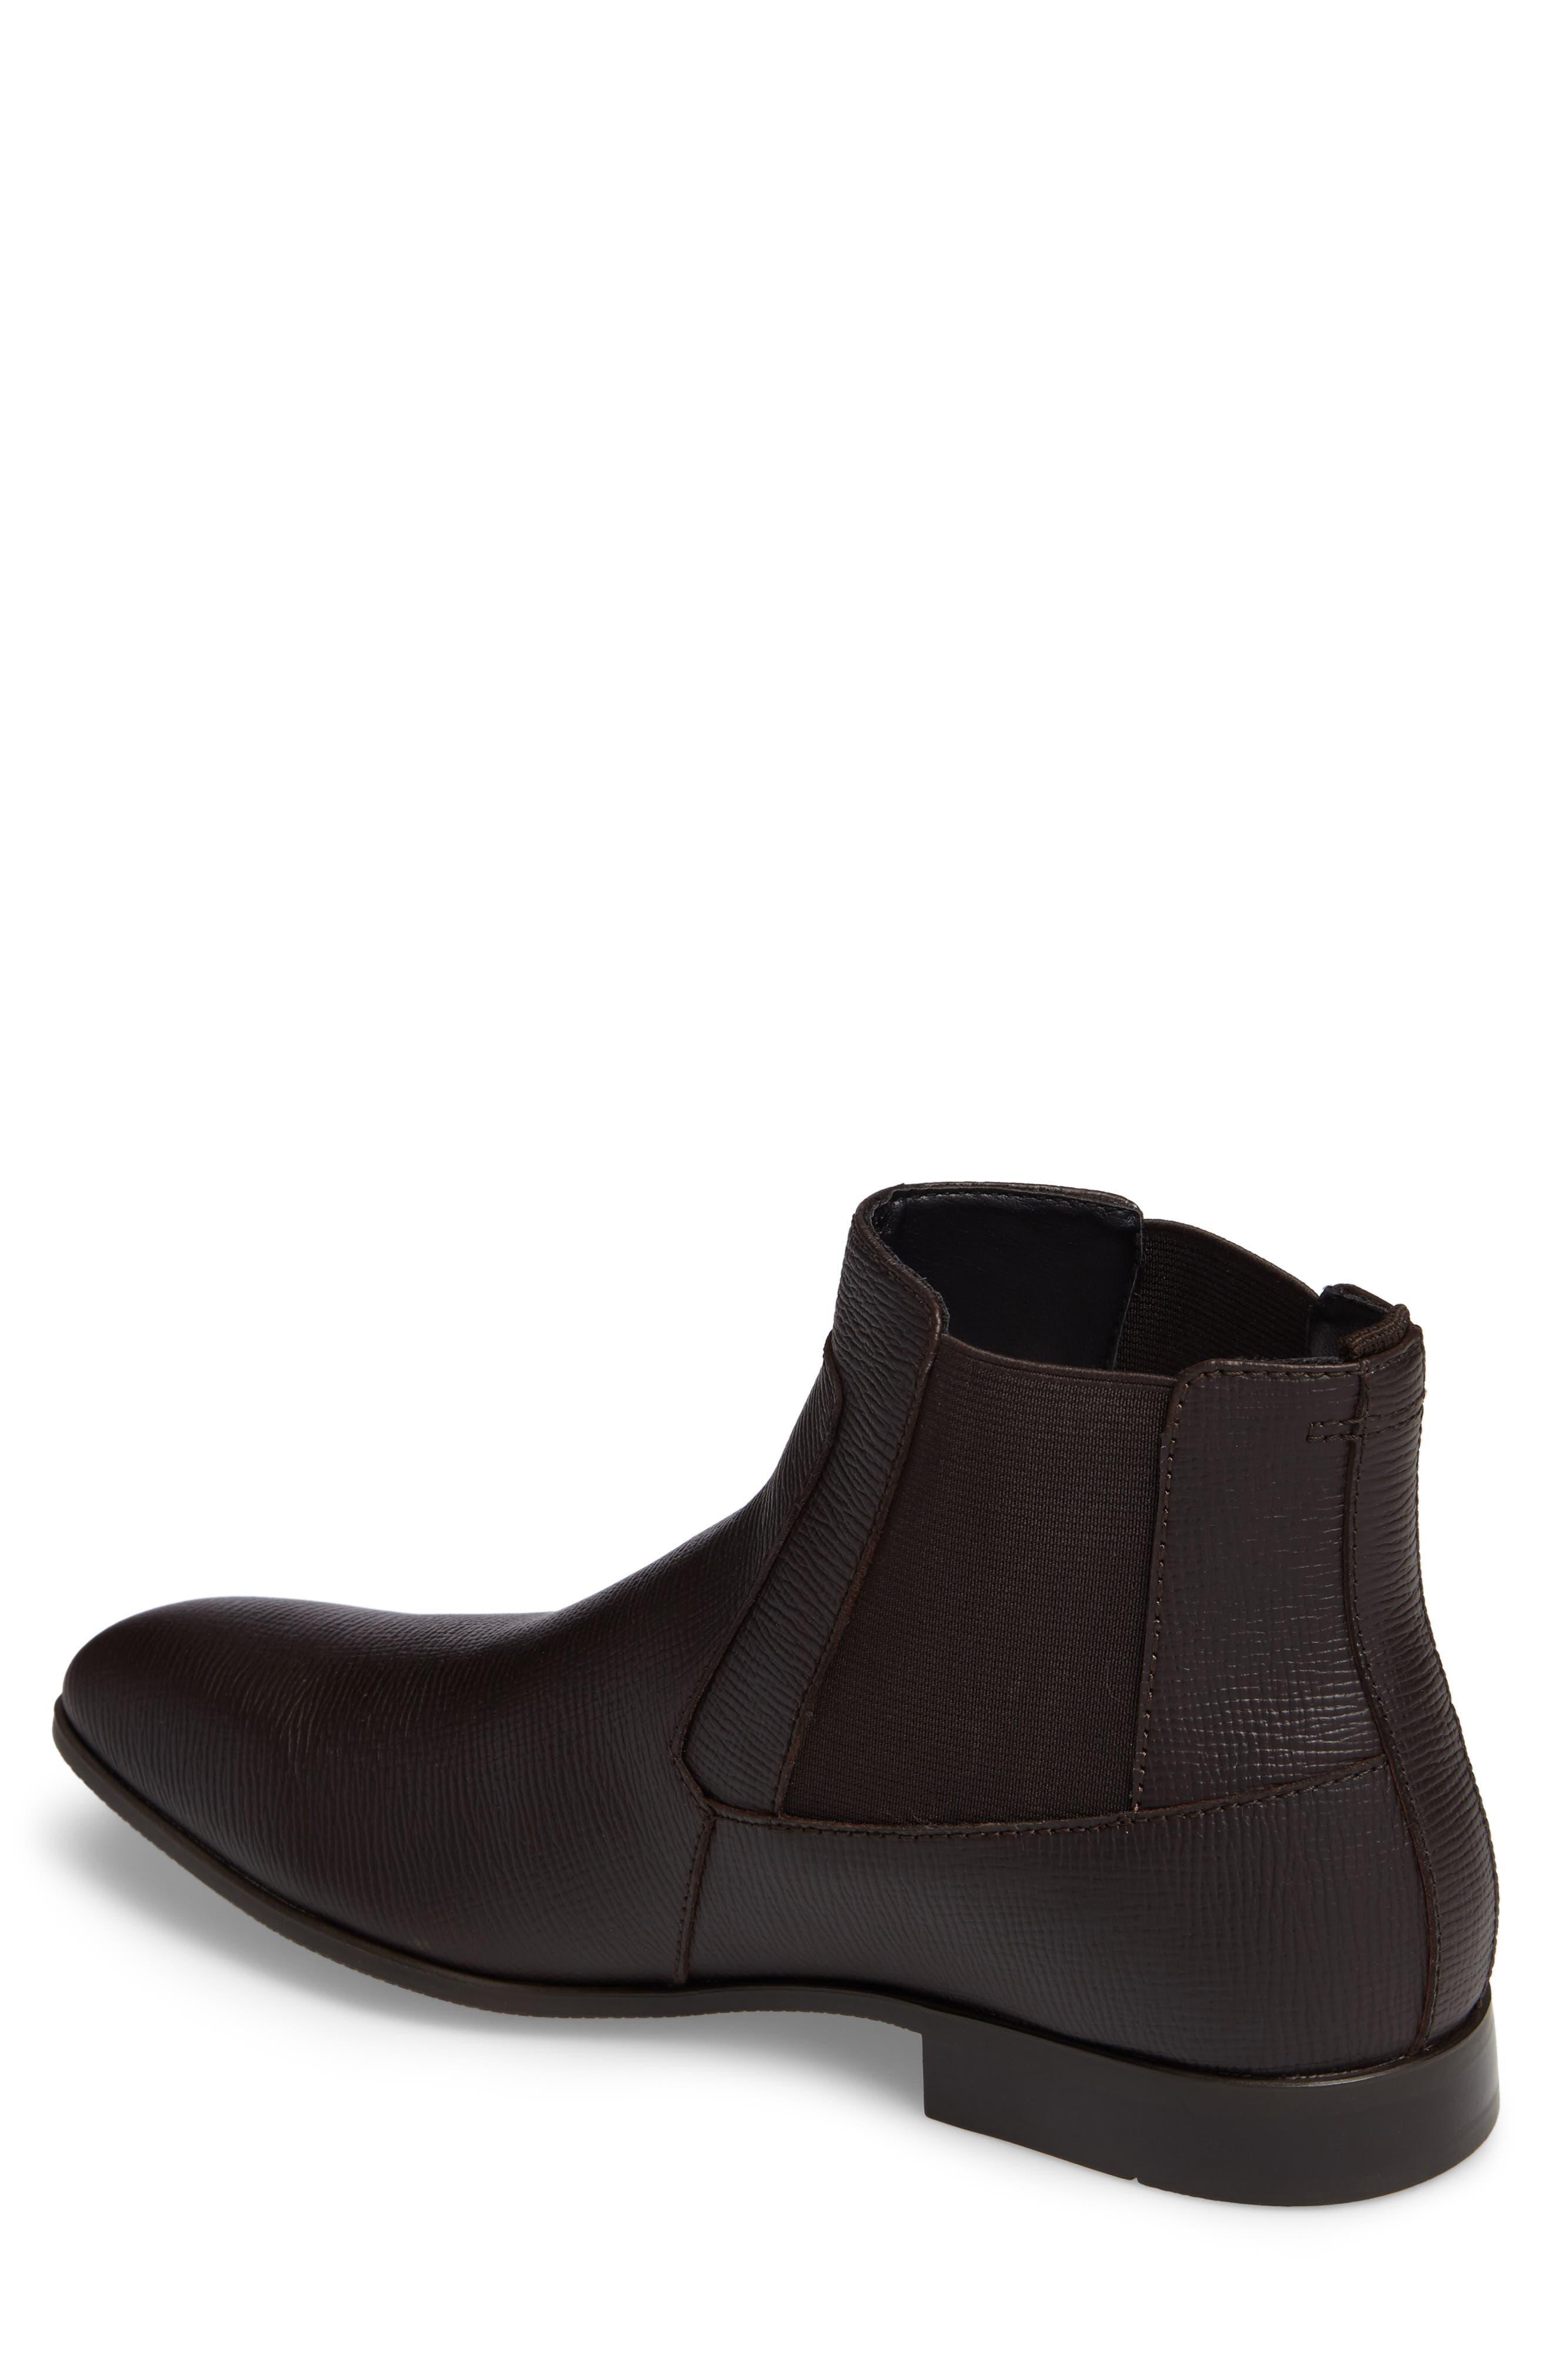 Christoff Chelsea Boot,                             Alternate thumbnail 2, color,                             Dark Brown Epi Leather